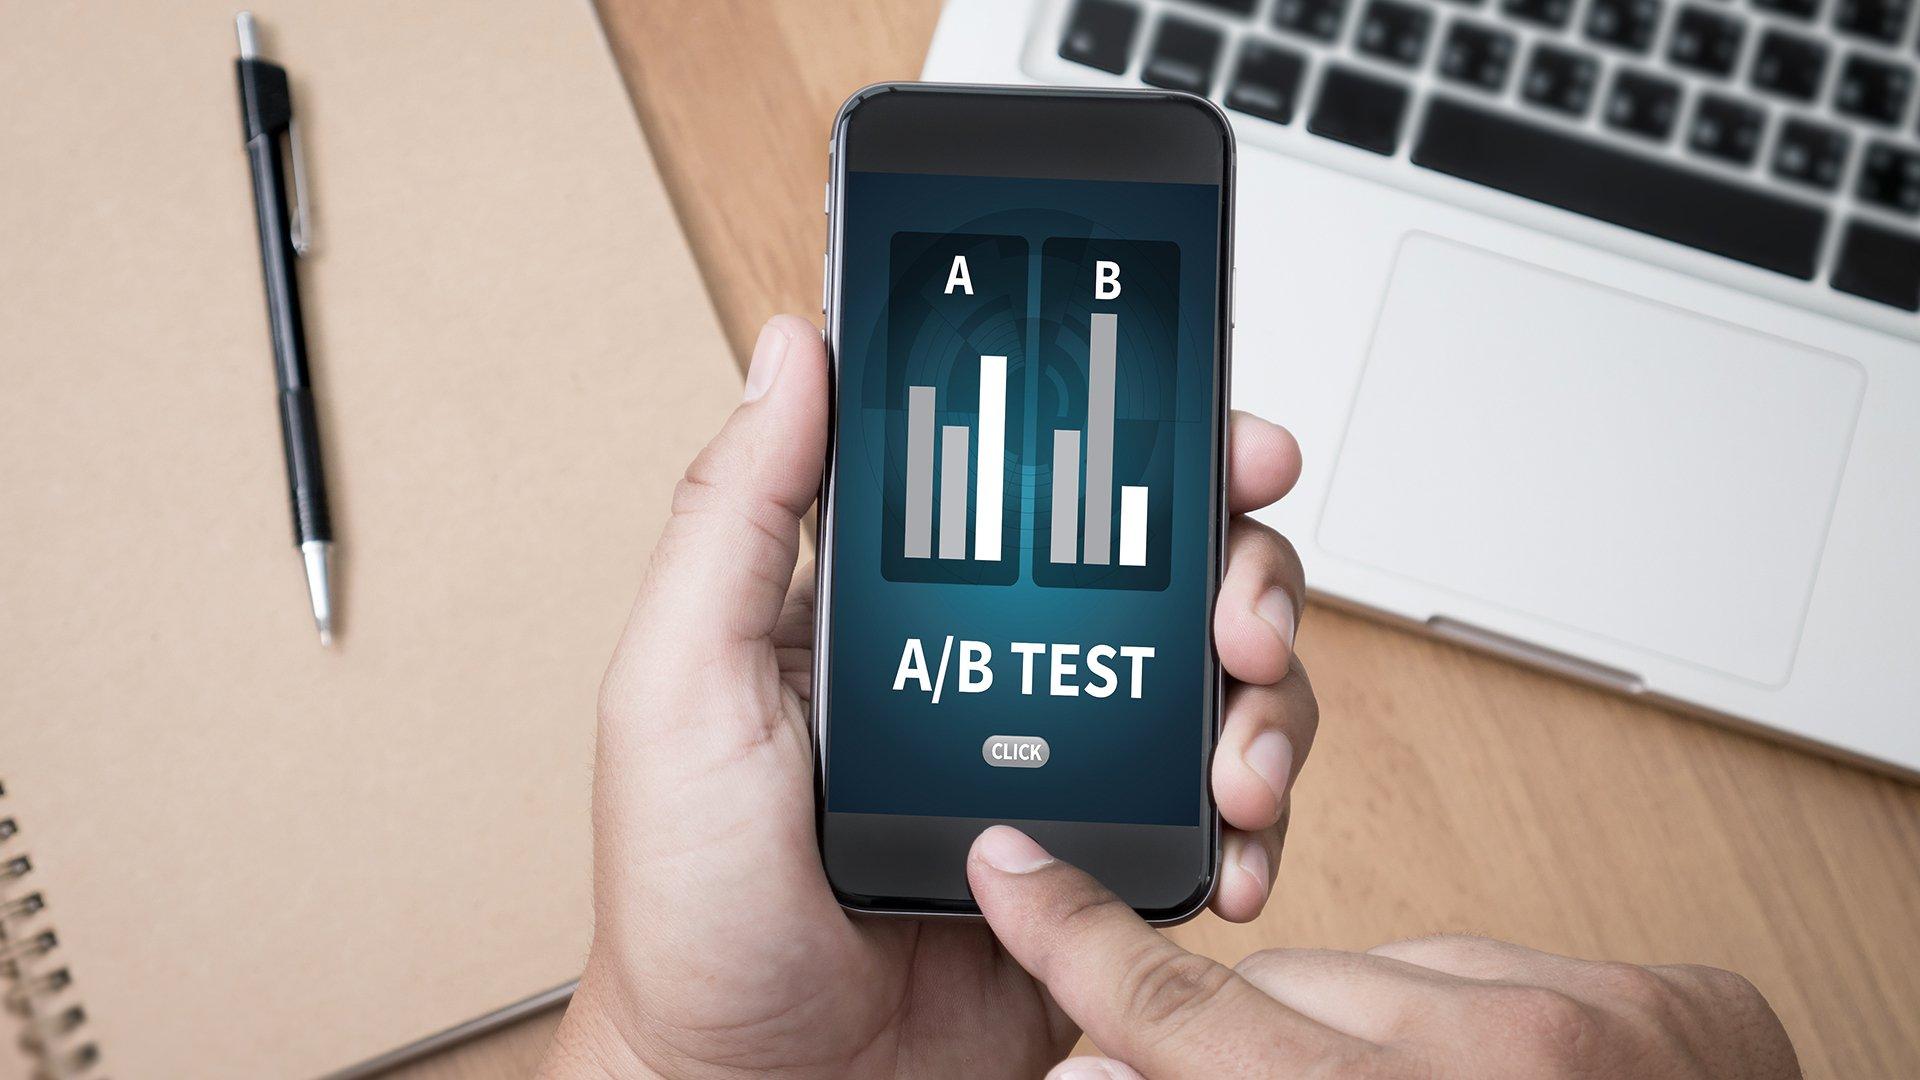 A/B testing charts